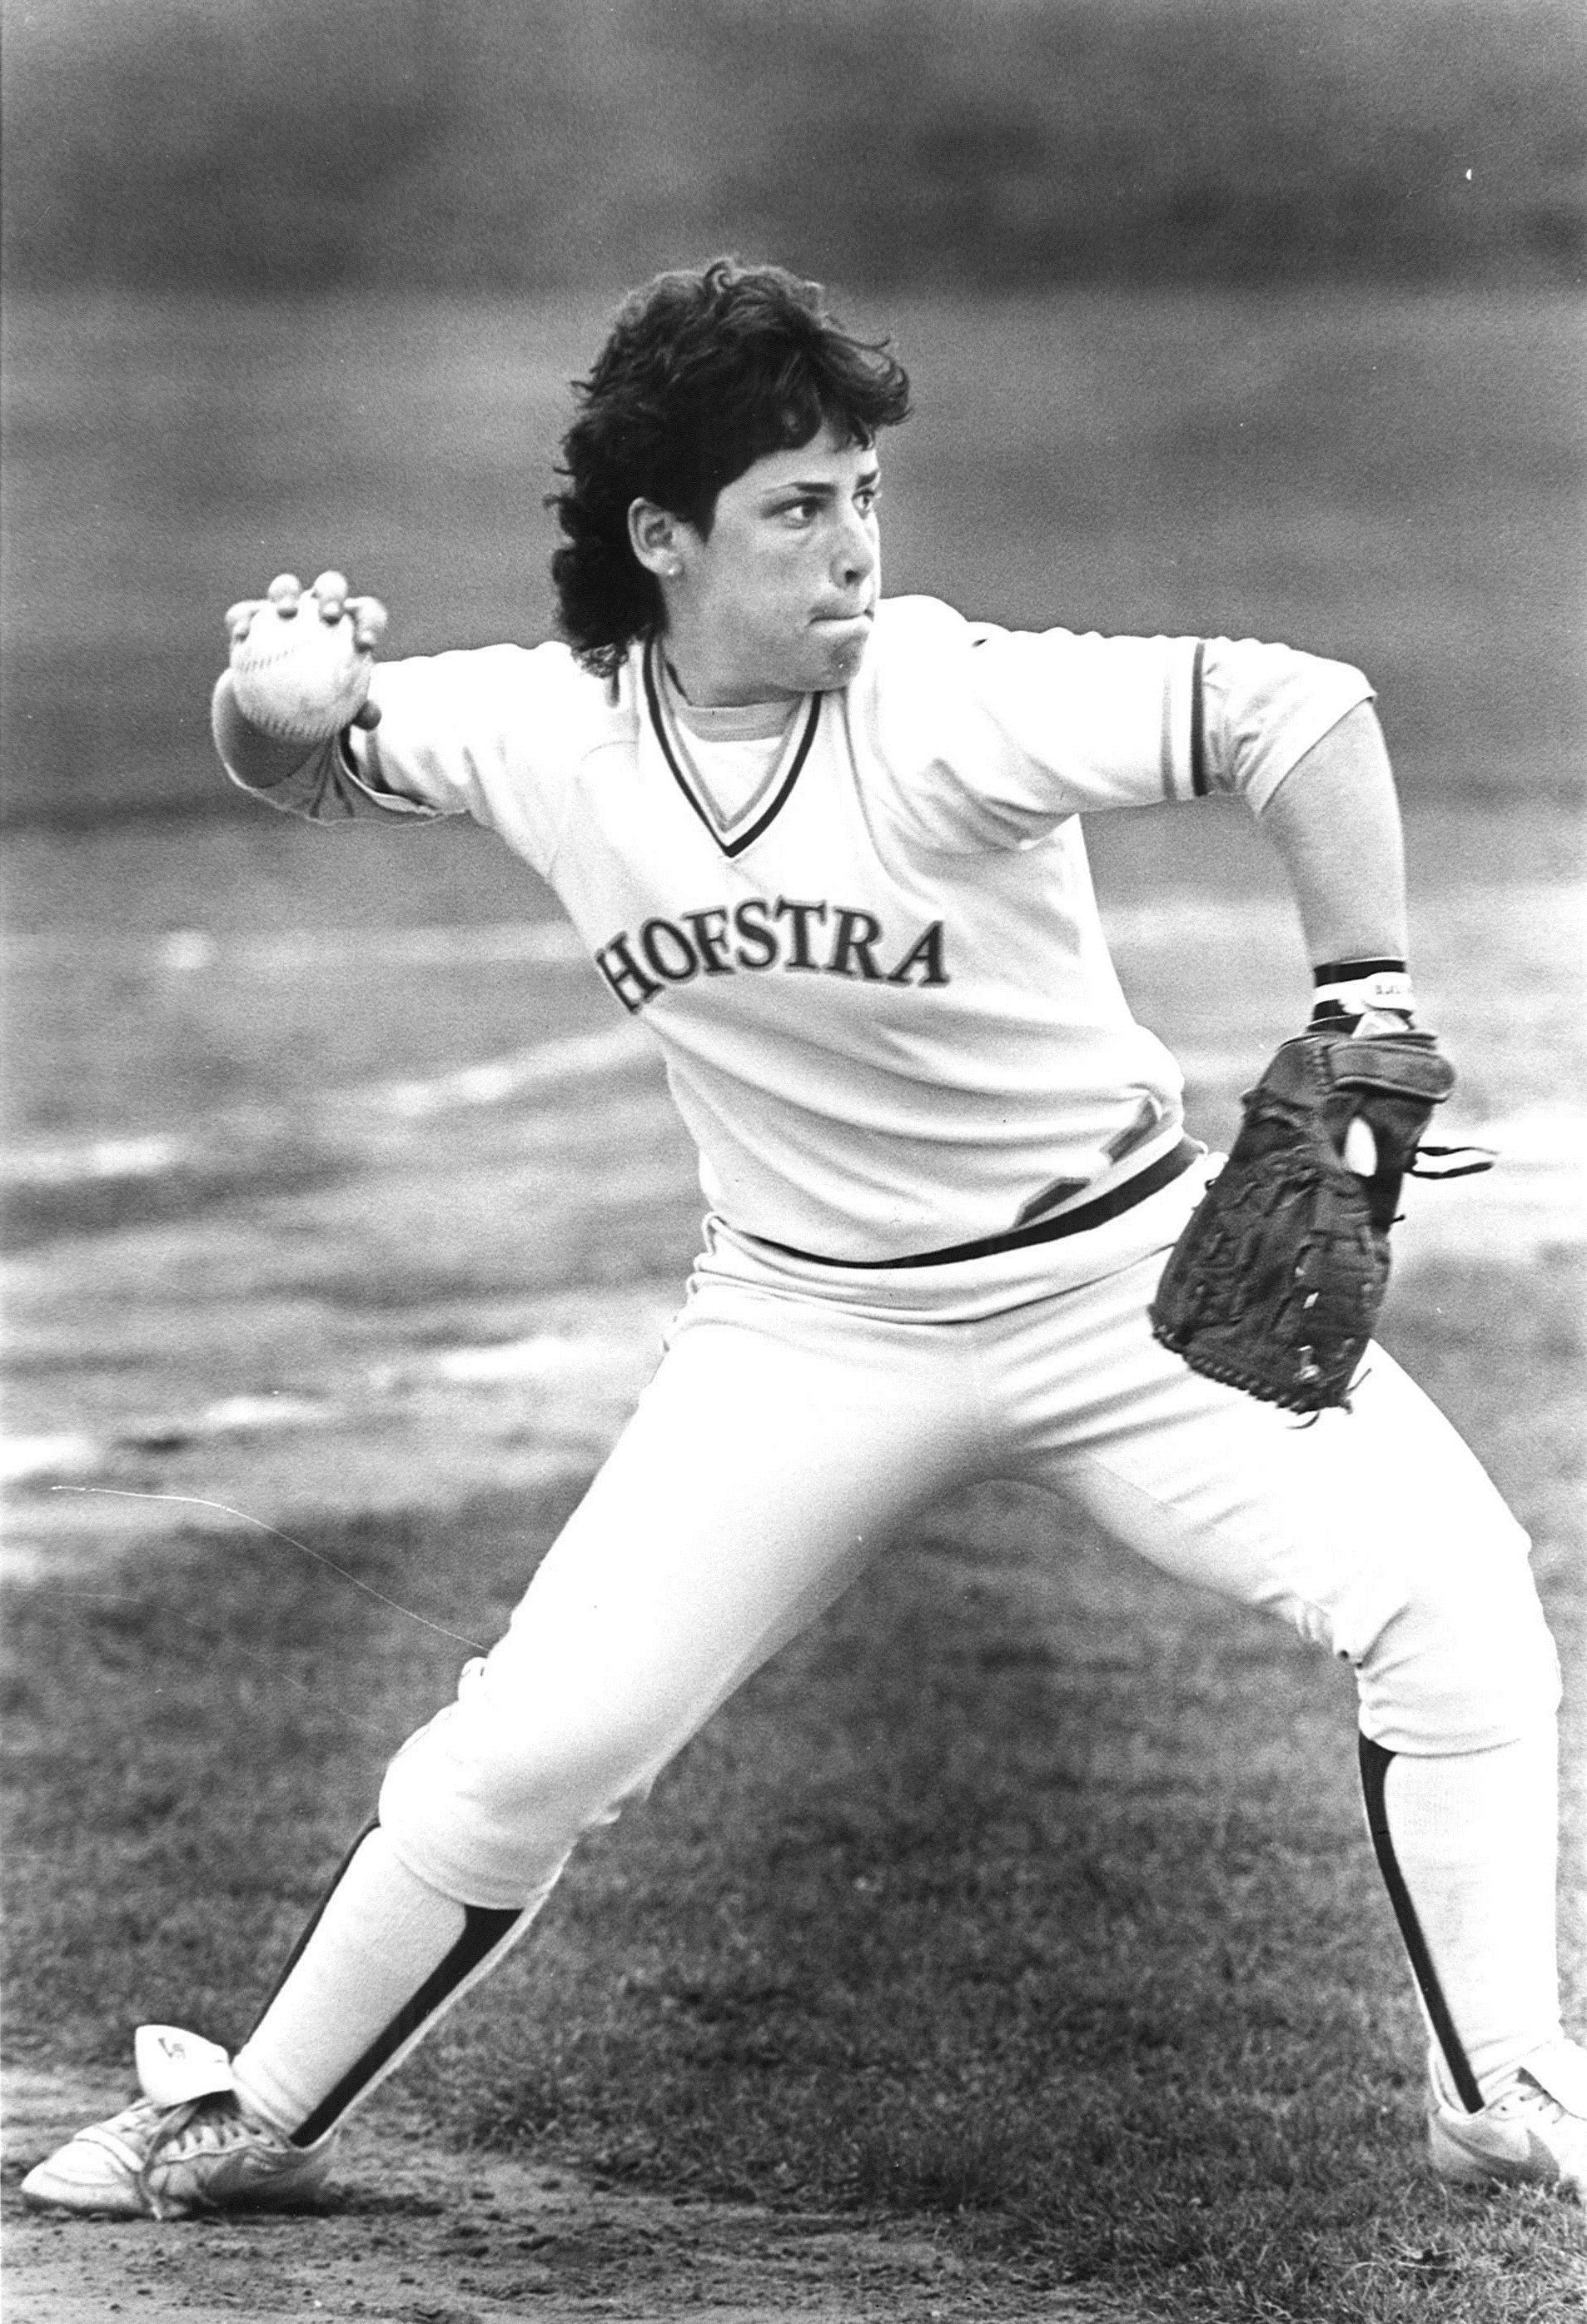 1987 Women's Softball pitcher Softball pitcher, Play